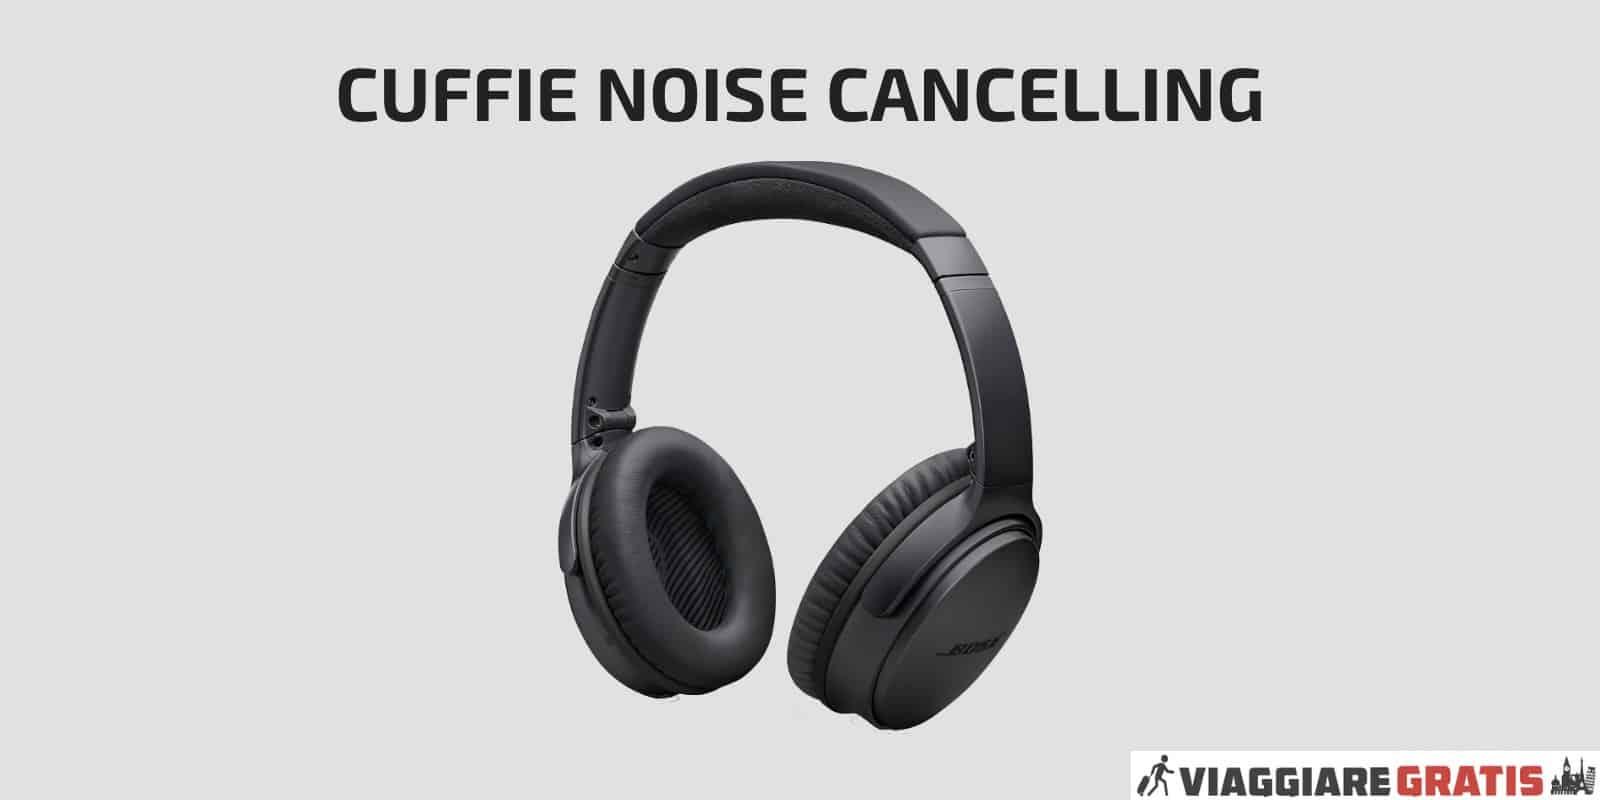 Cuffie noise cancelling cuffie antirumore